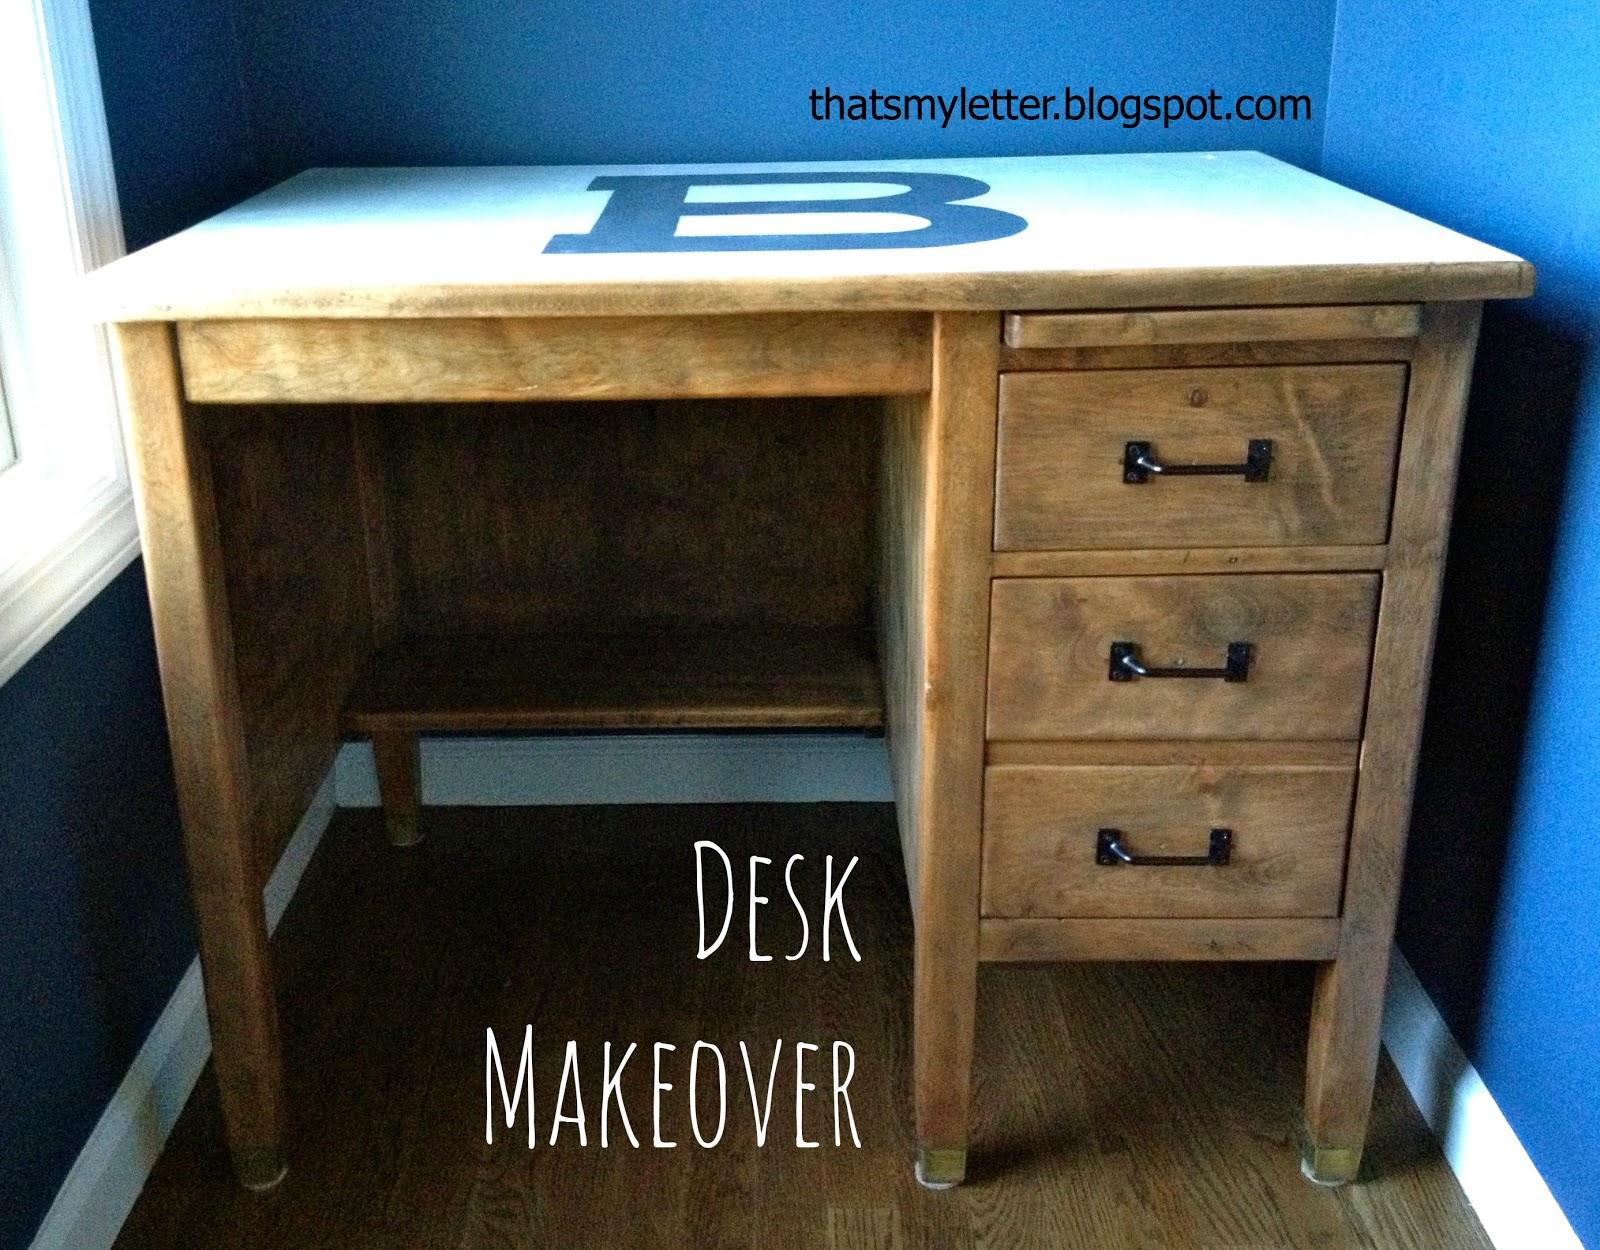 Desk Makeover With Monogram